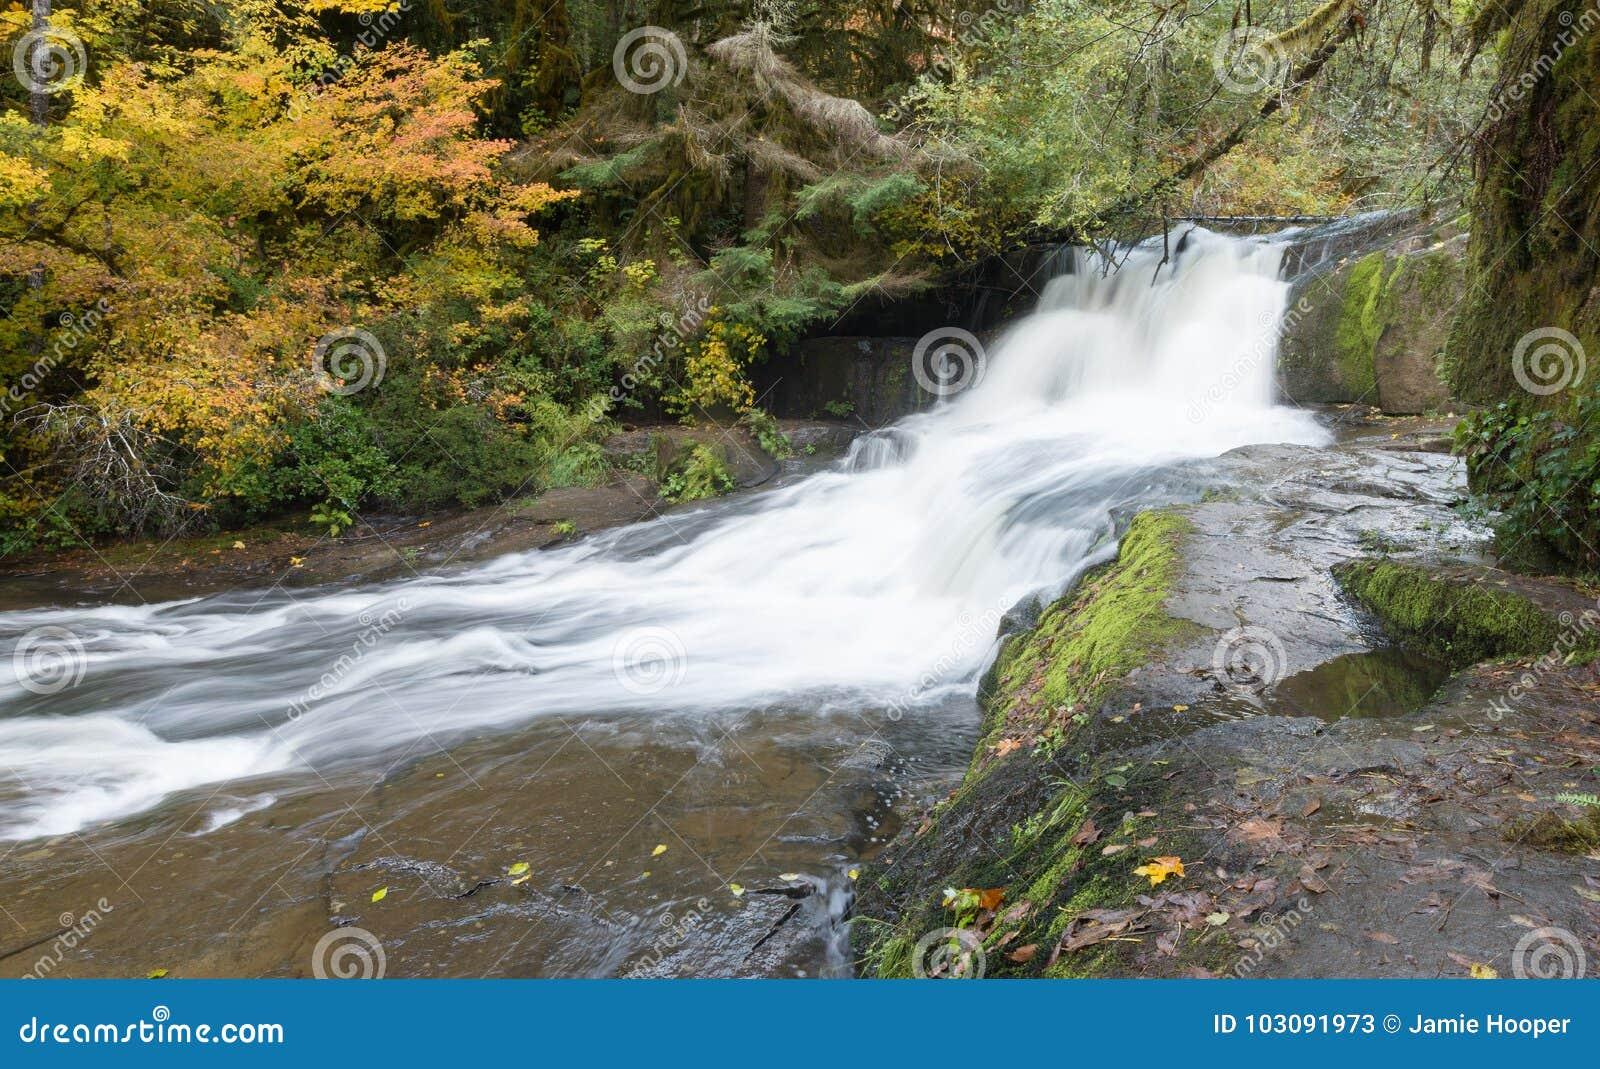 Coast Range Falls